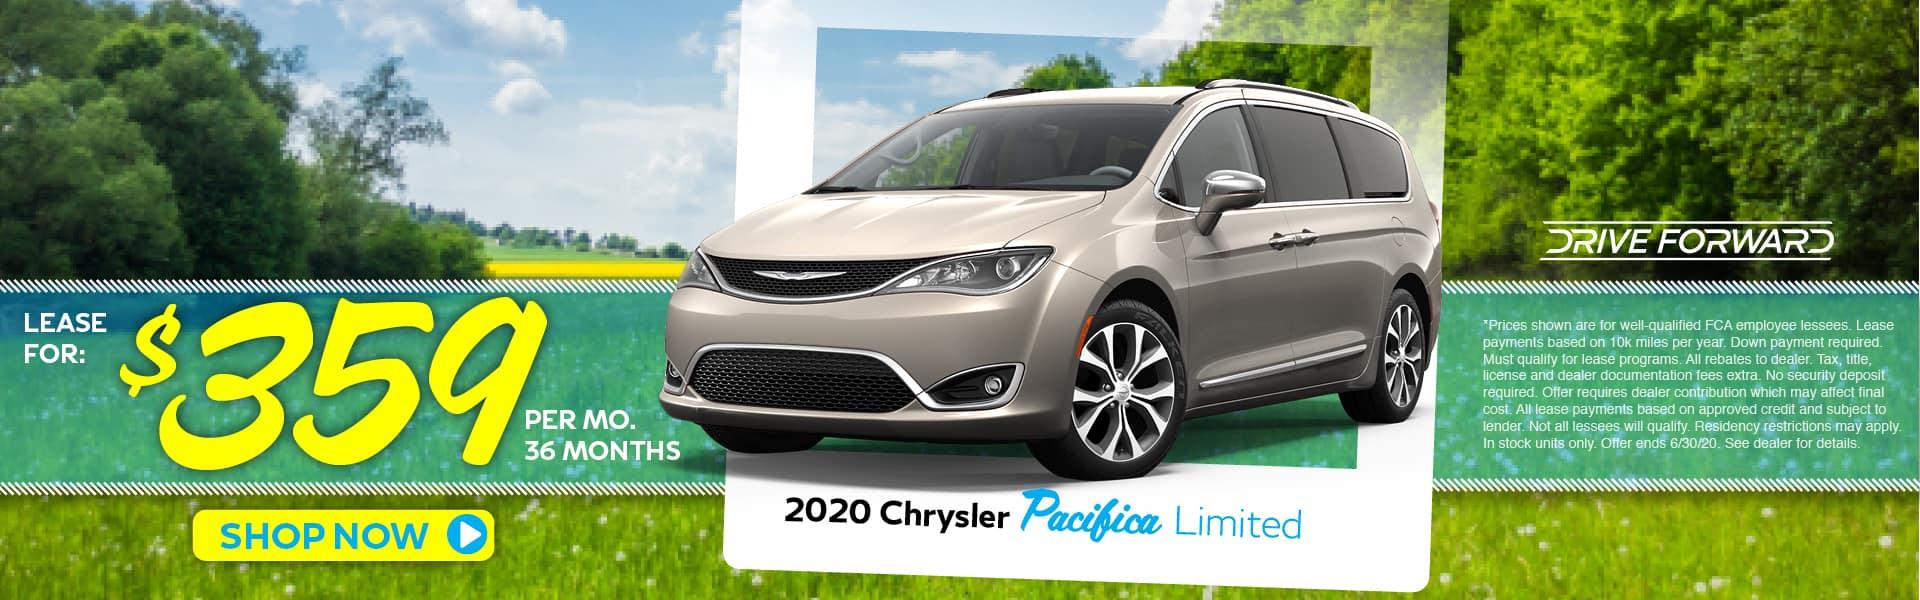 2020 Chrysler Pacifica Crew Cab Lease Specials in Pinckney, MI